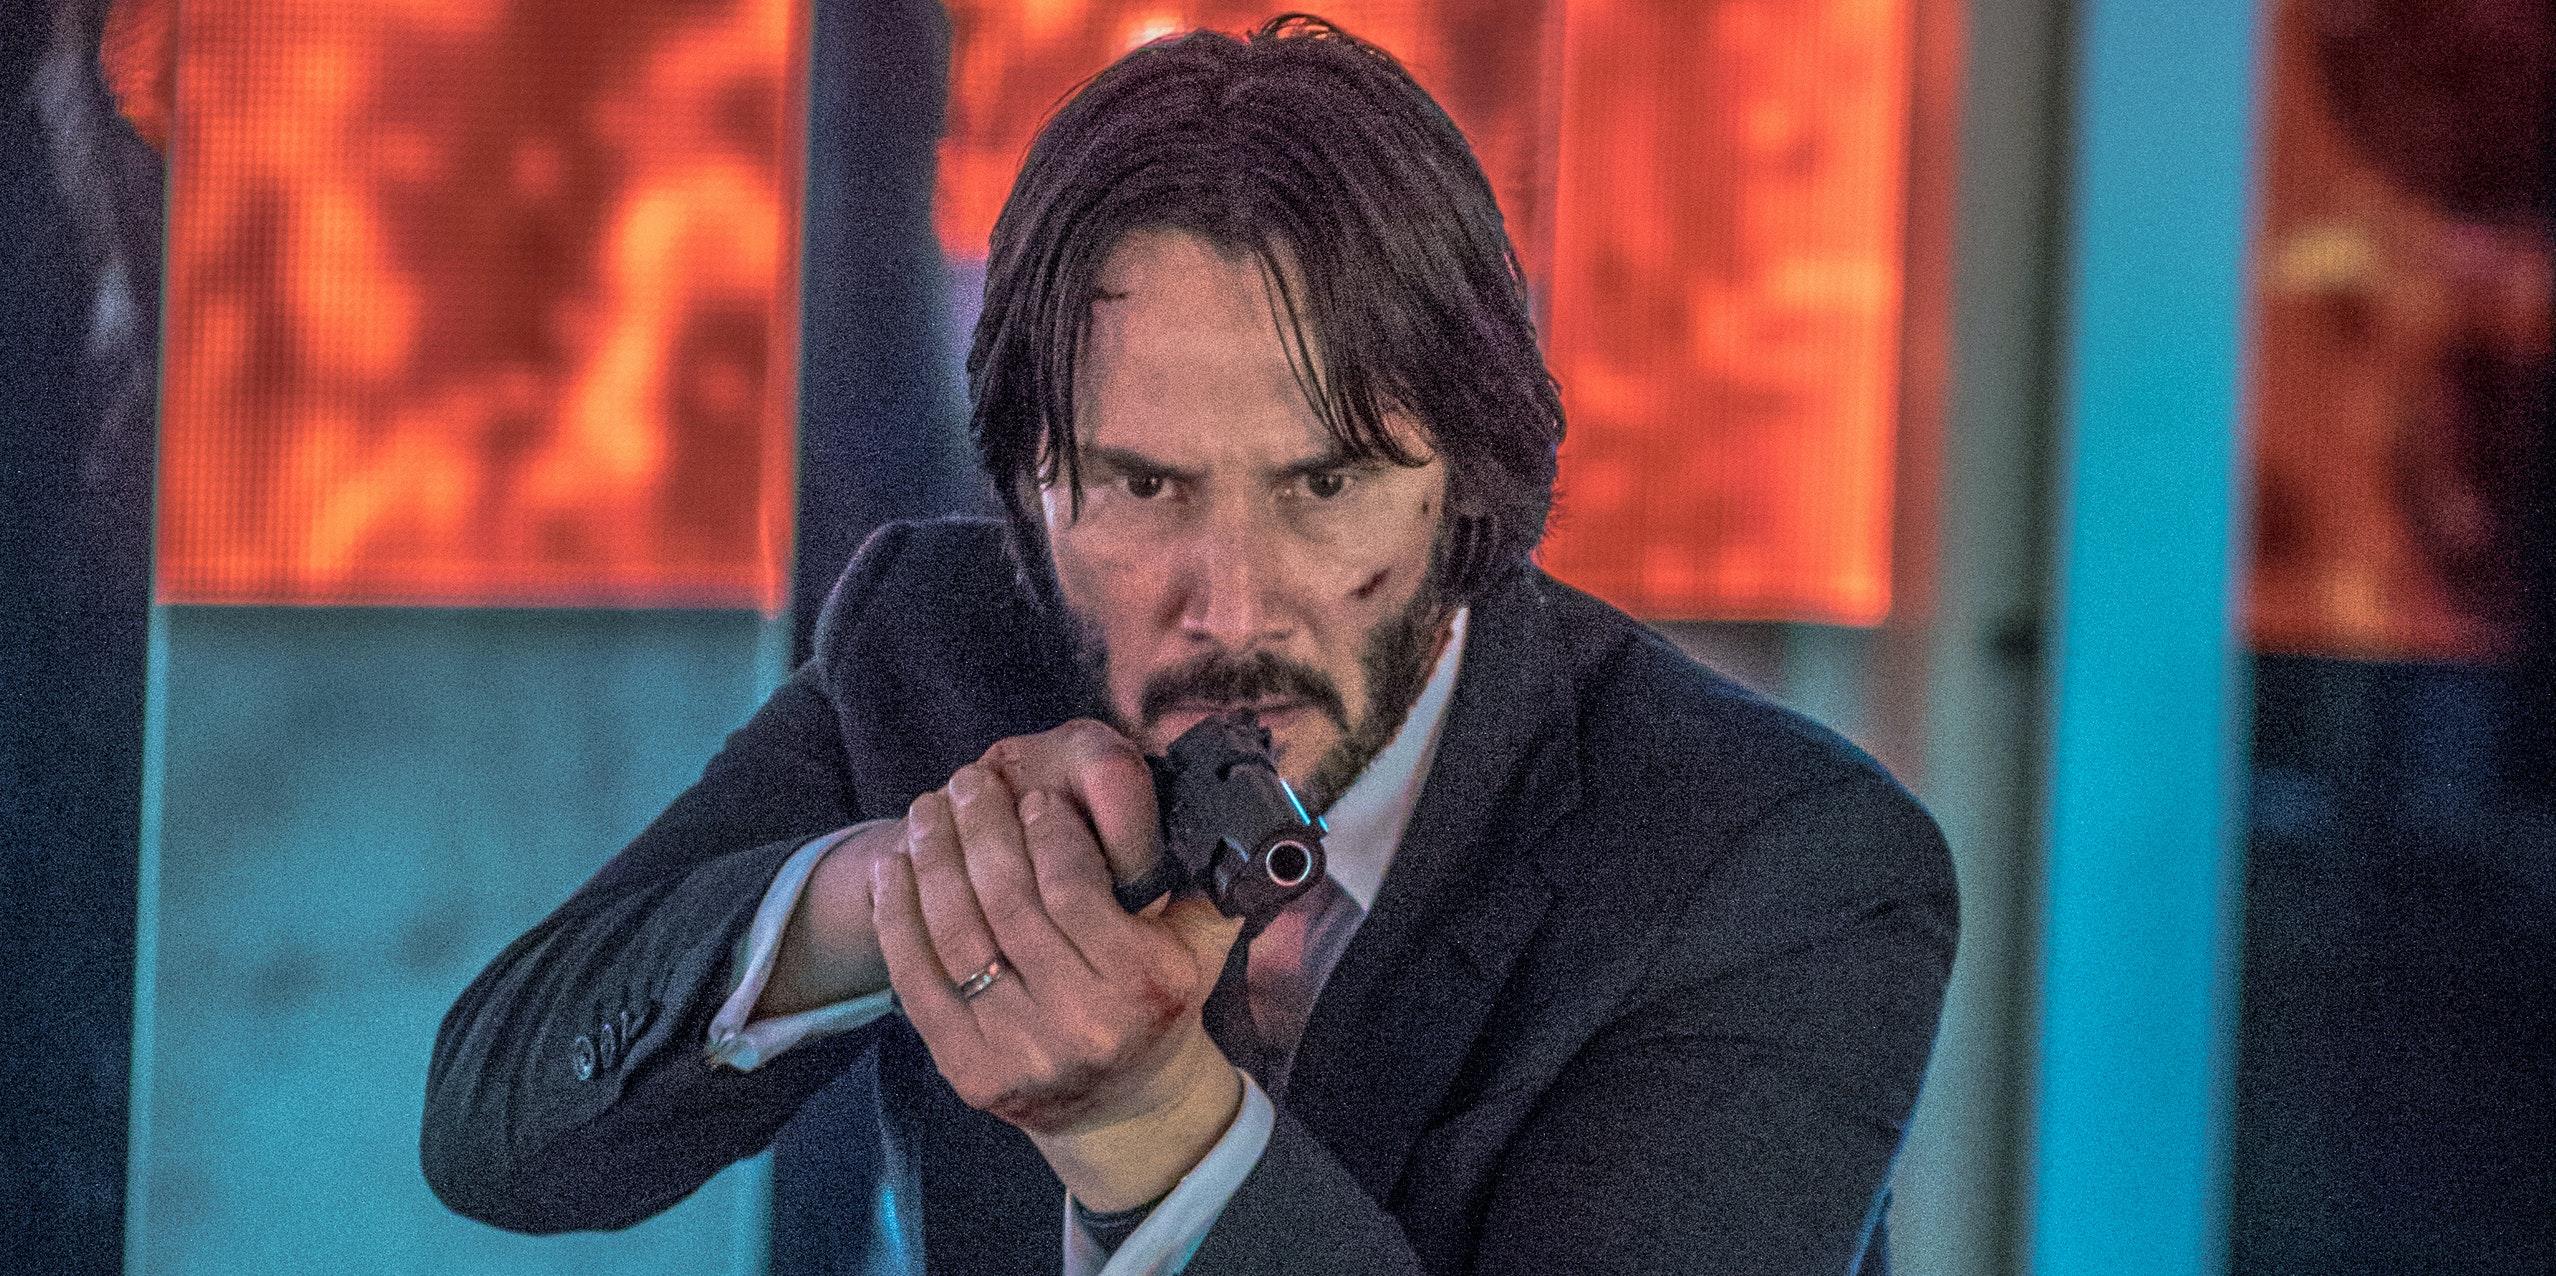 John Wick: Photos Show Keanu Reeves Filming 'John Wick 2' In Rome